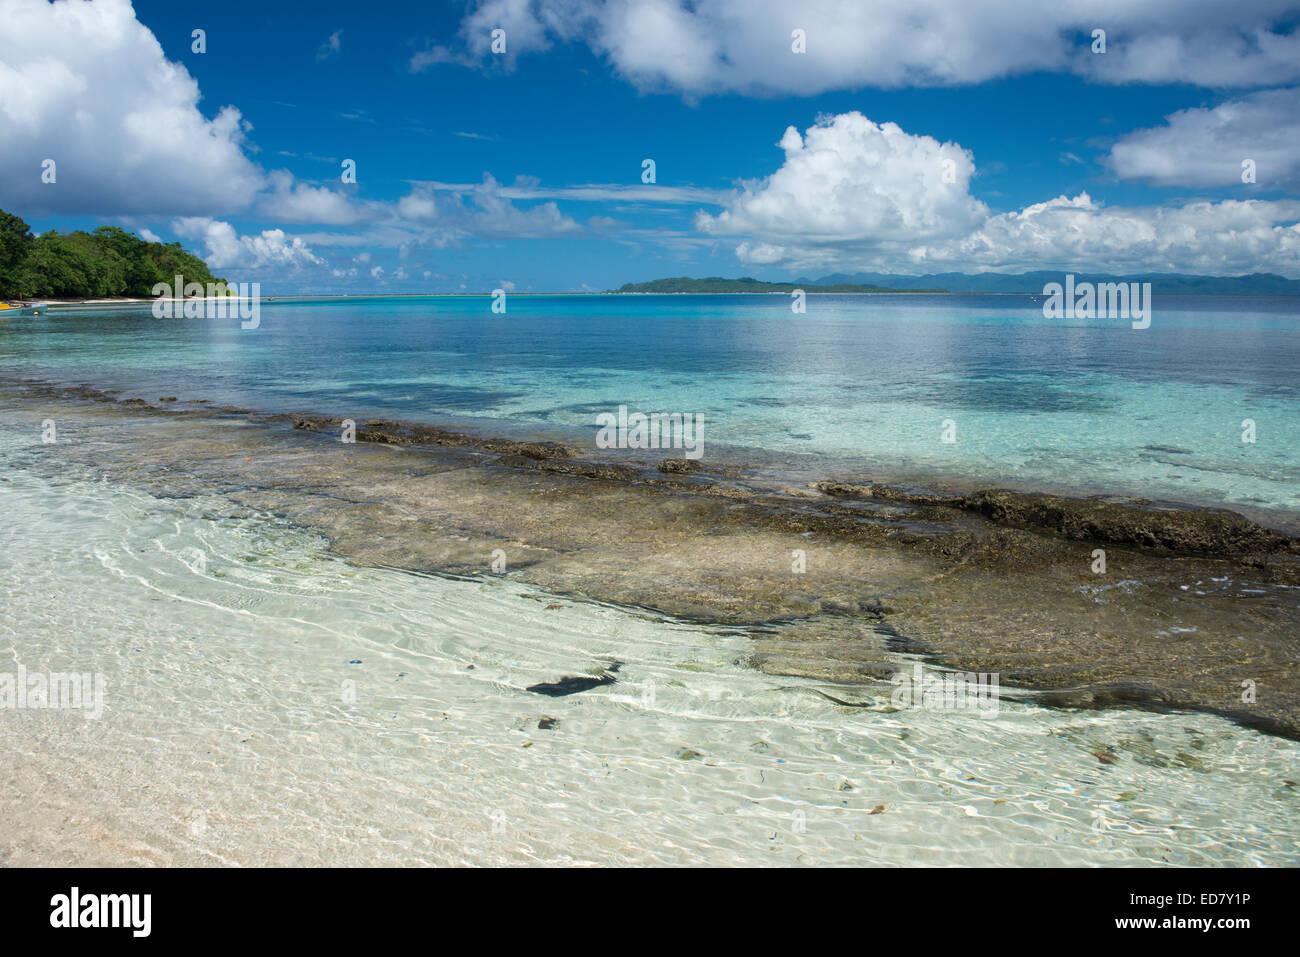 Melanesia, Makira-Ulawa Province, Solomon Islands, island of Owaraha or Owa Raha (formerly known as Santa Ana). - Stock Image